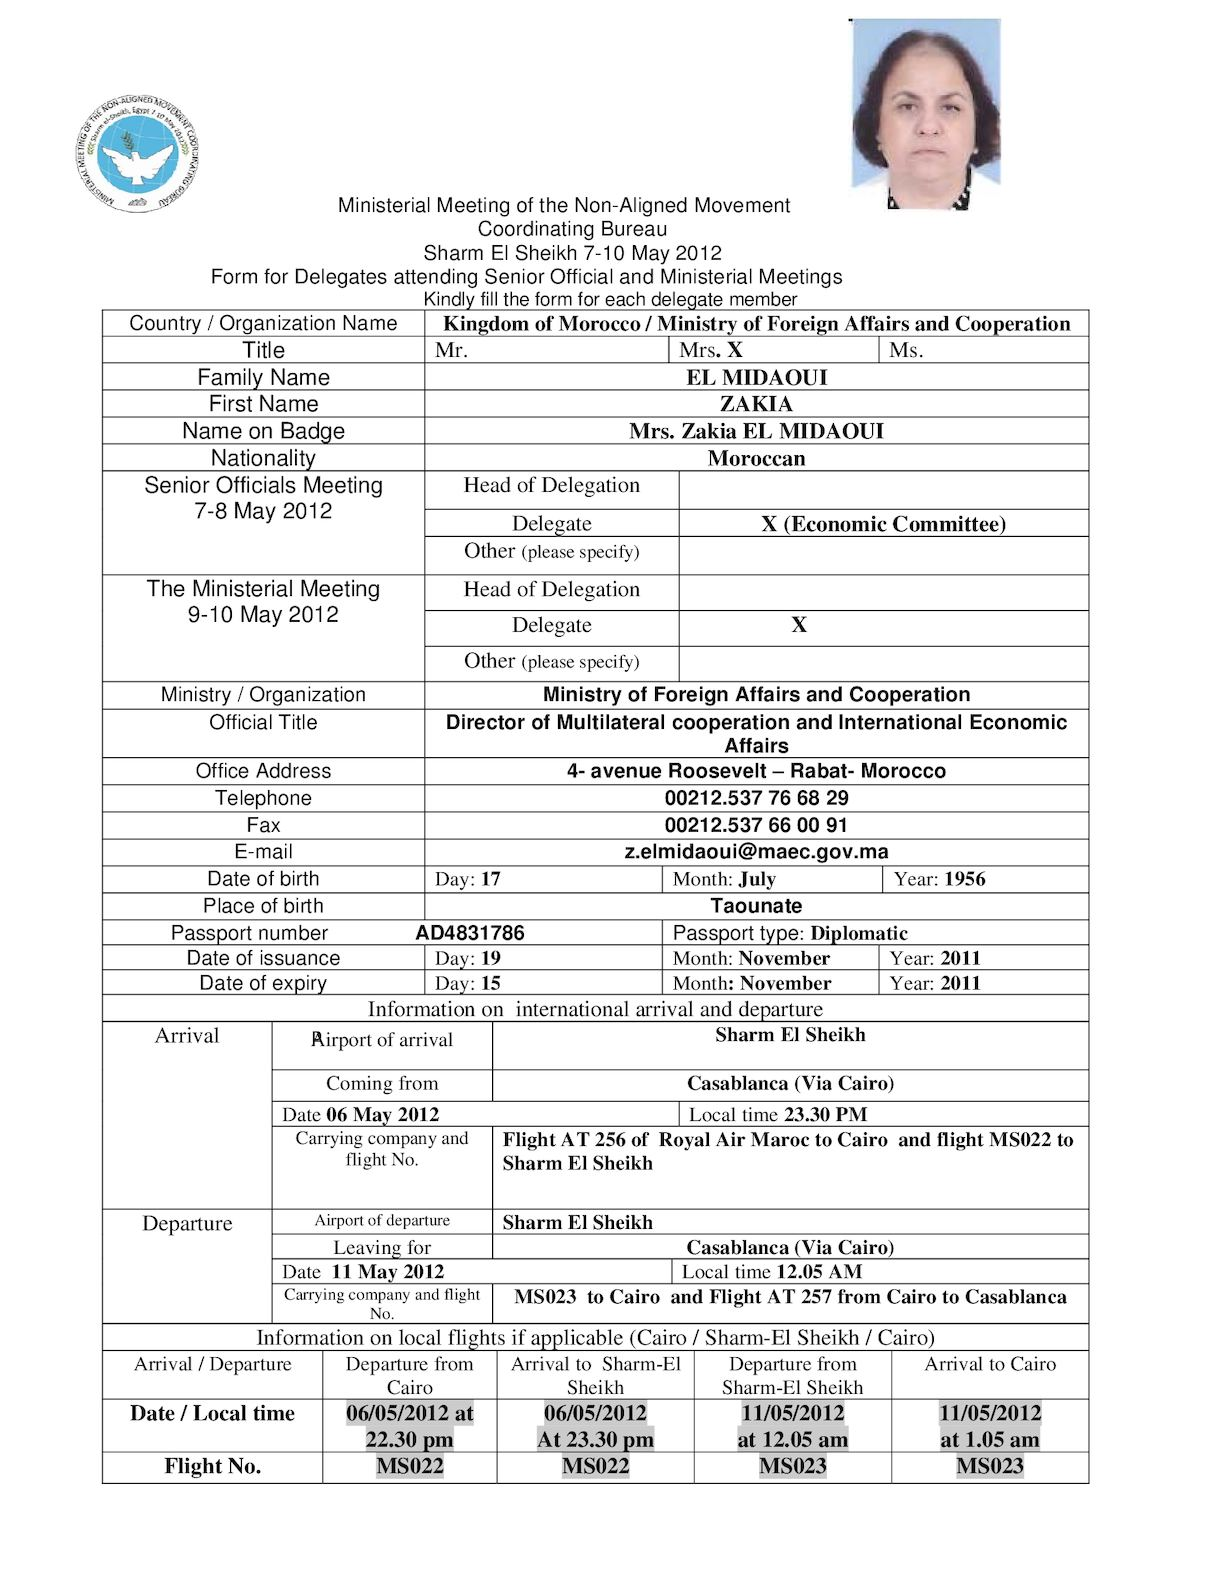 Mrs. Zakia El Midaoui  Registration Form Pdf